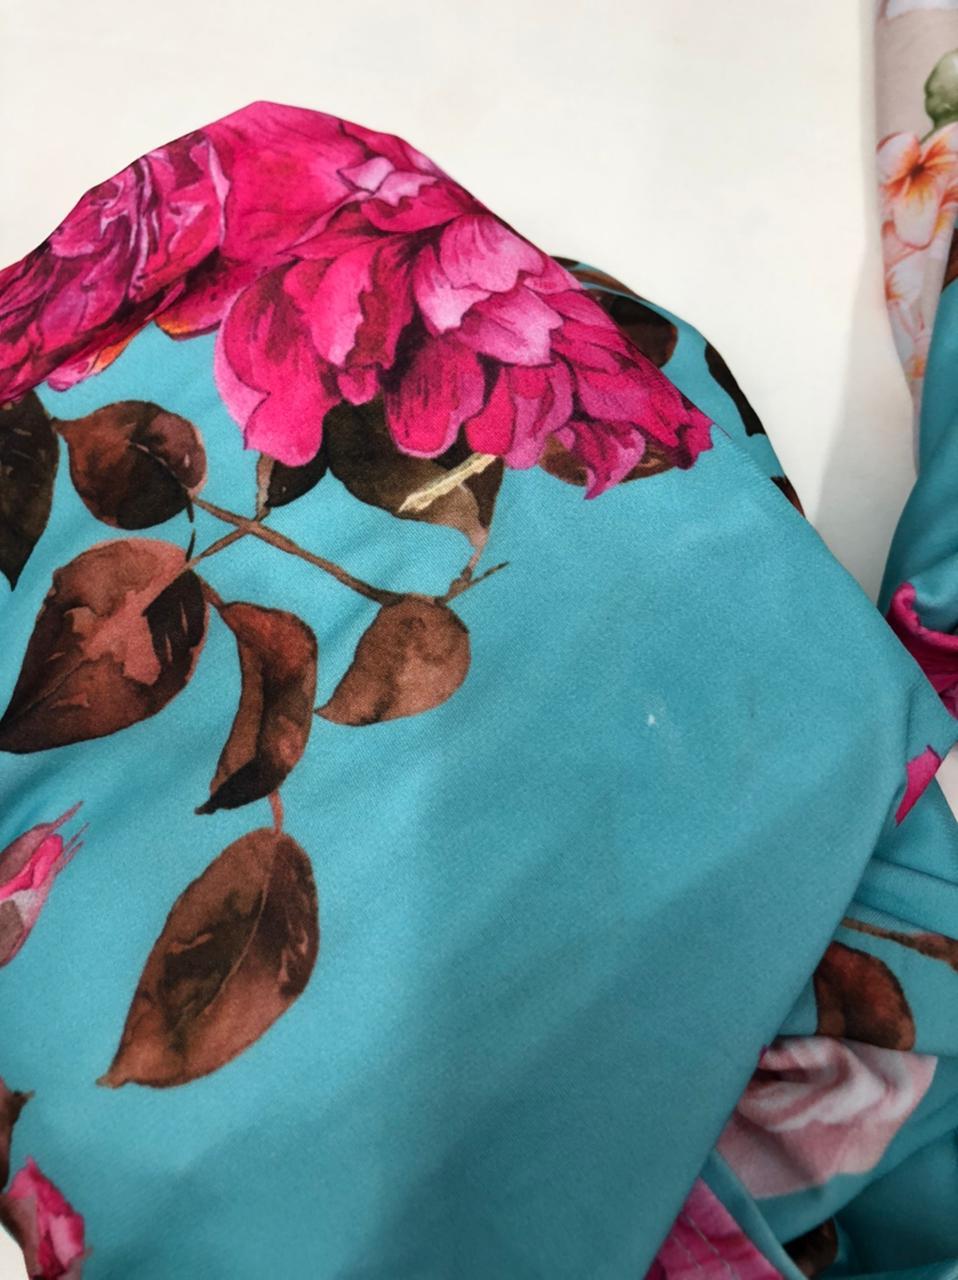 SALDO 495 Conjunto Liz Floral Azul Tam UNICO